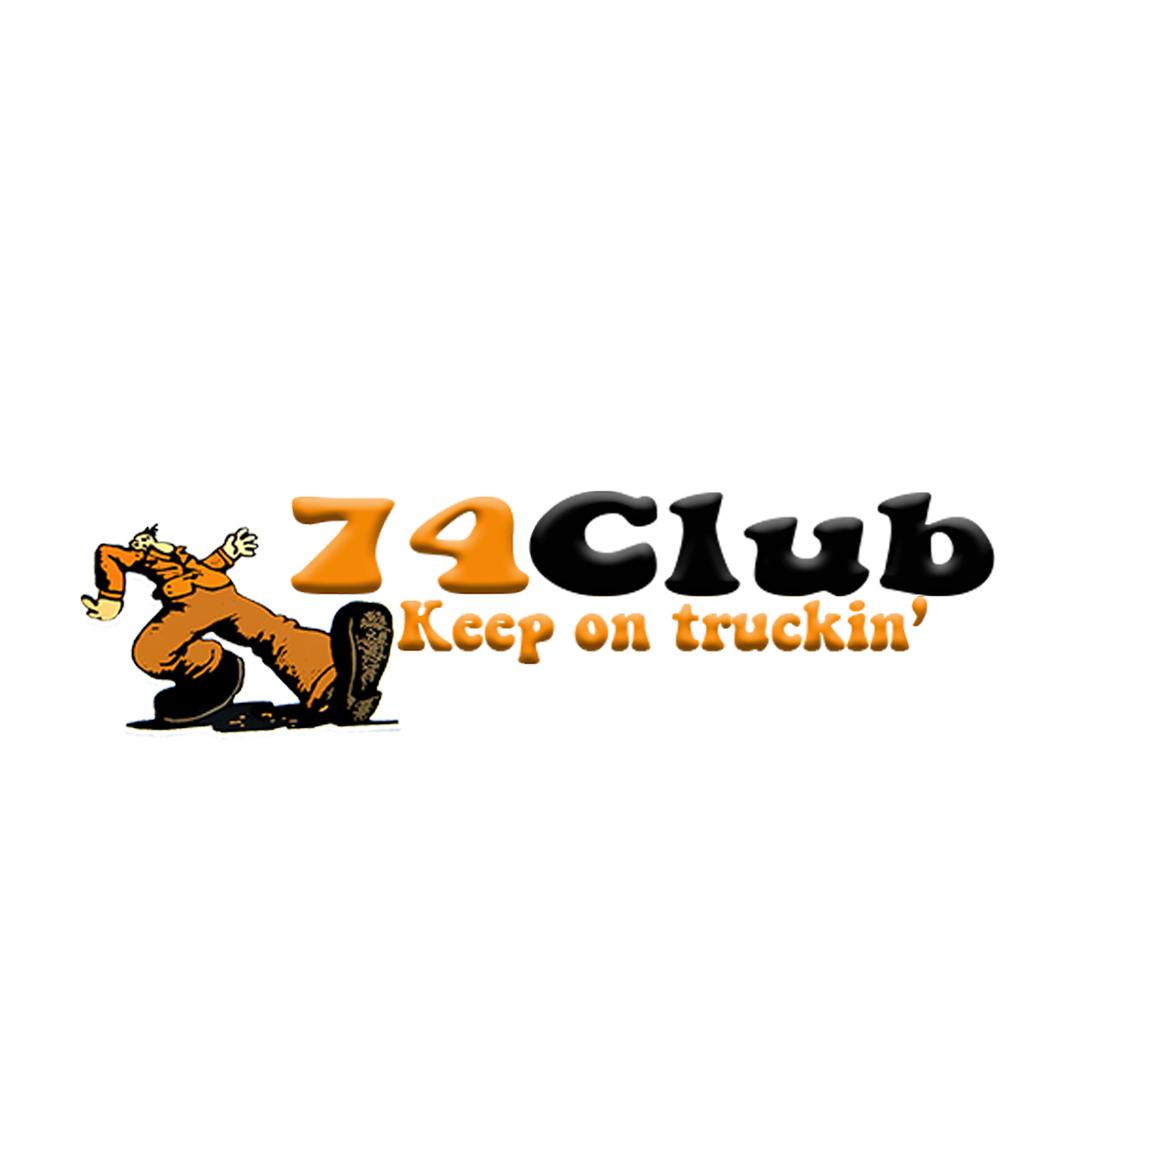 http://walterscontrols.net/wp-content/uploads/2019/12/74club.png